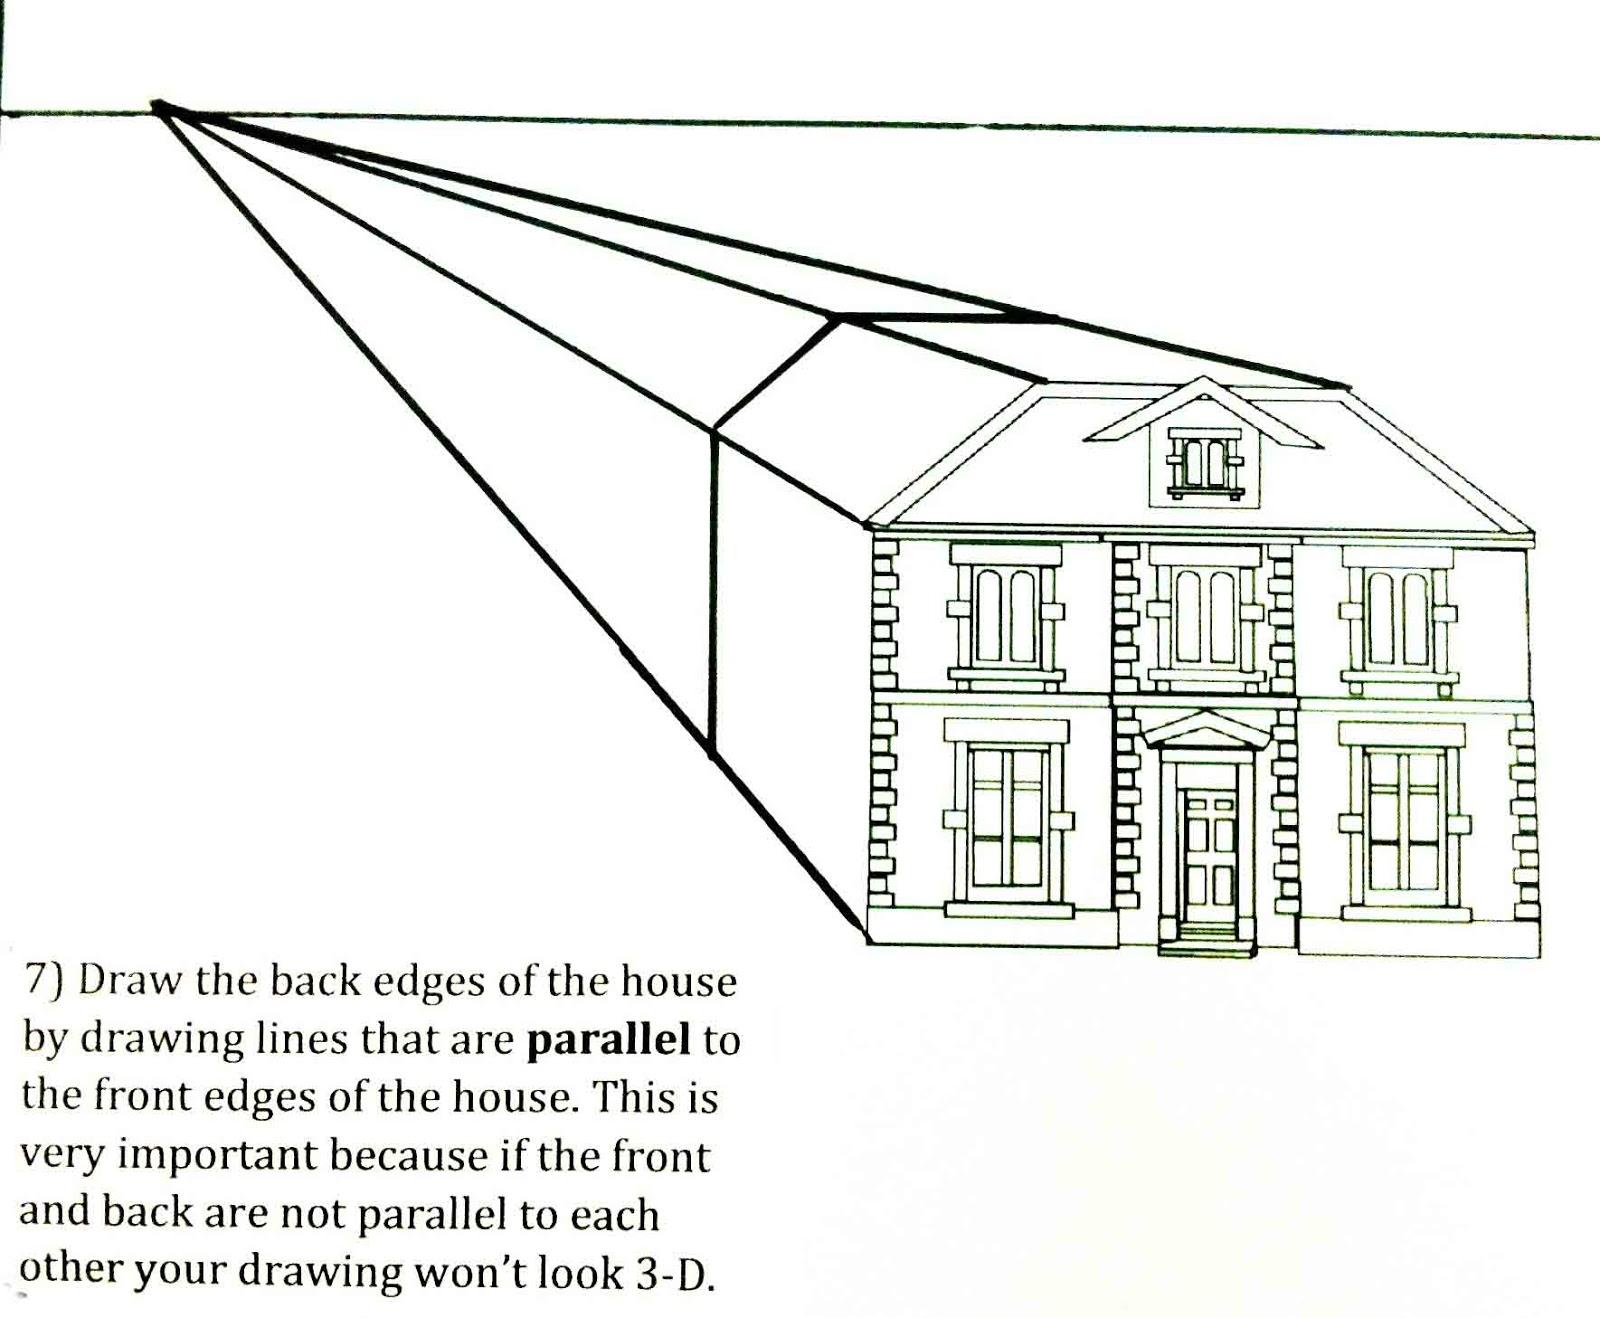 Drawn building dimensional Helpful Art The house a